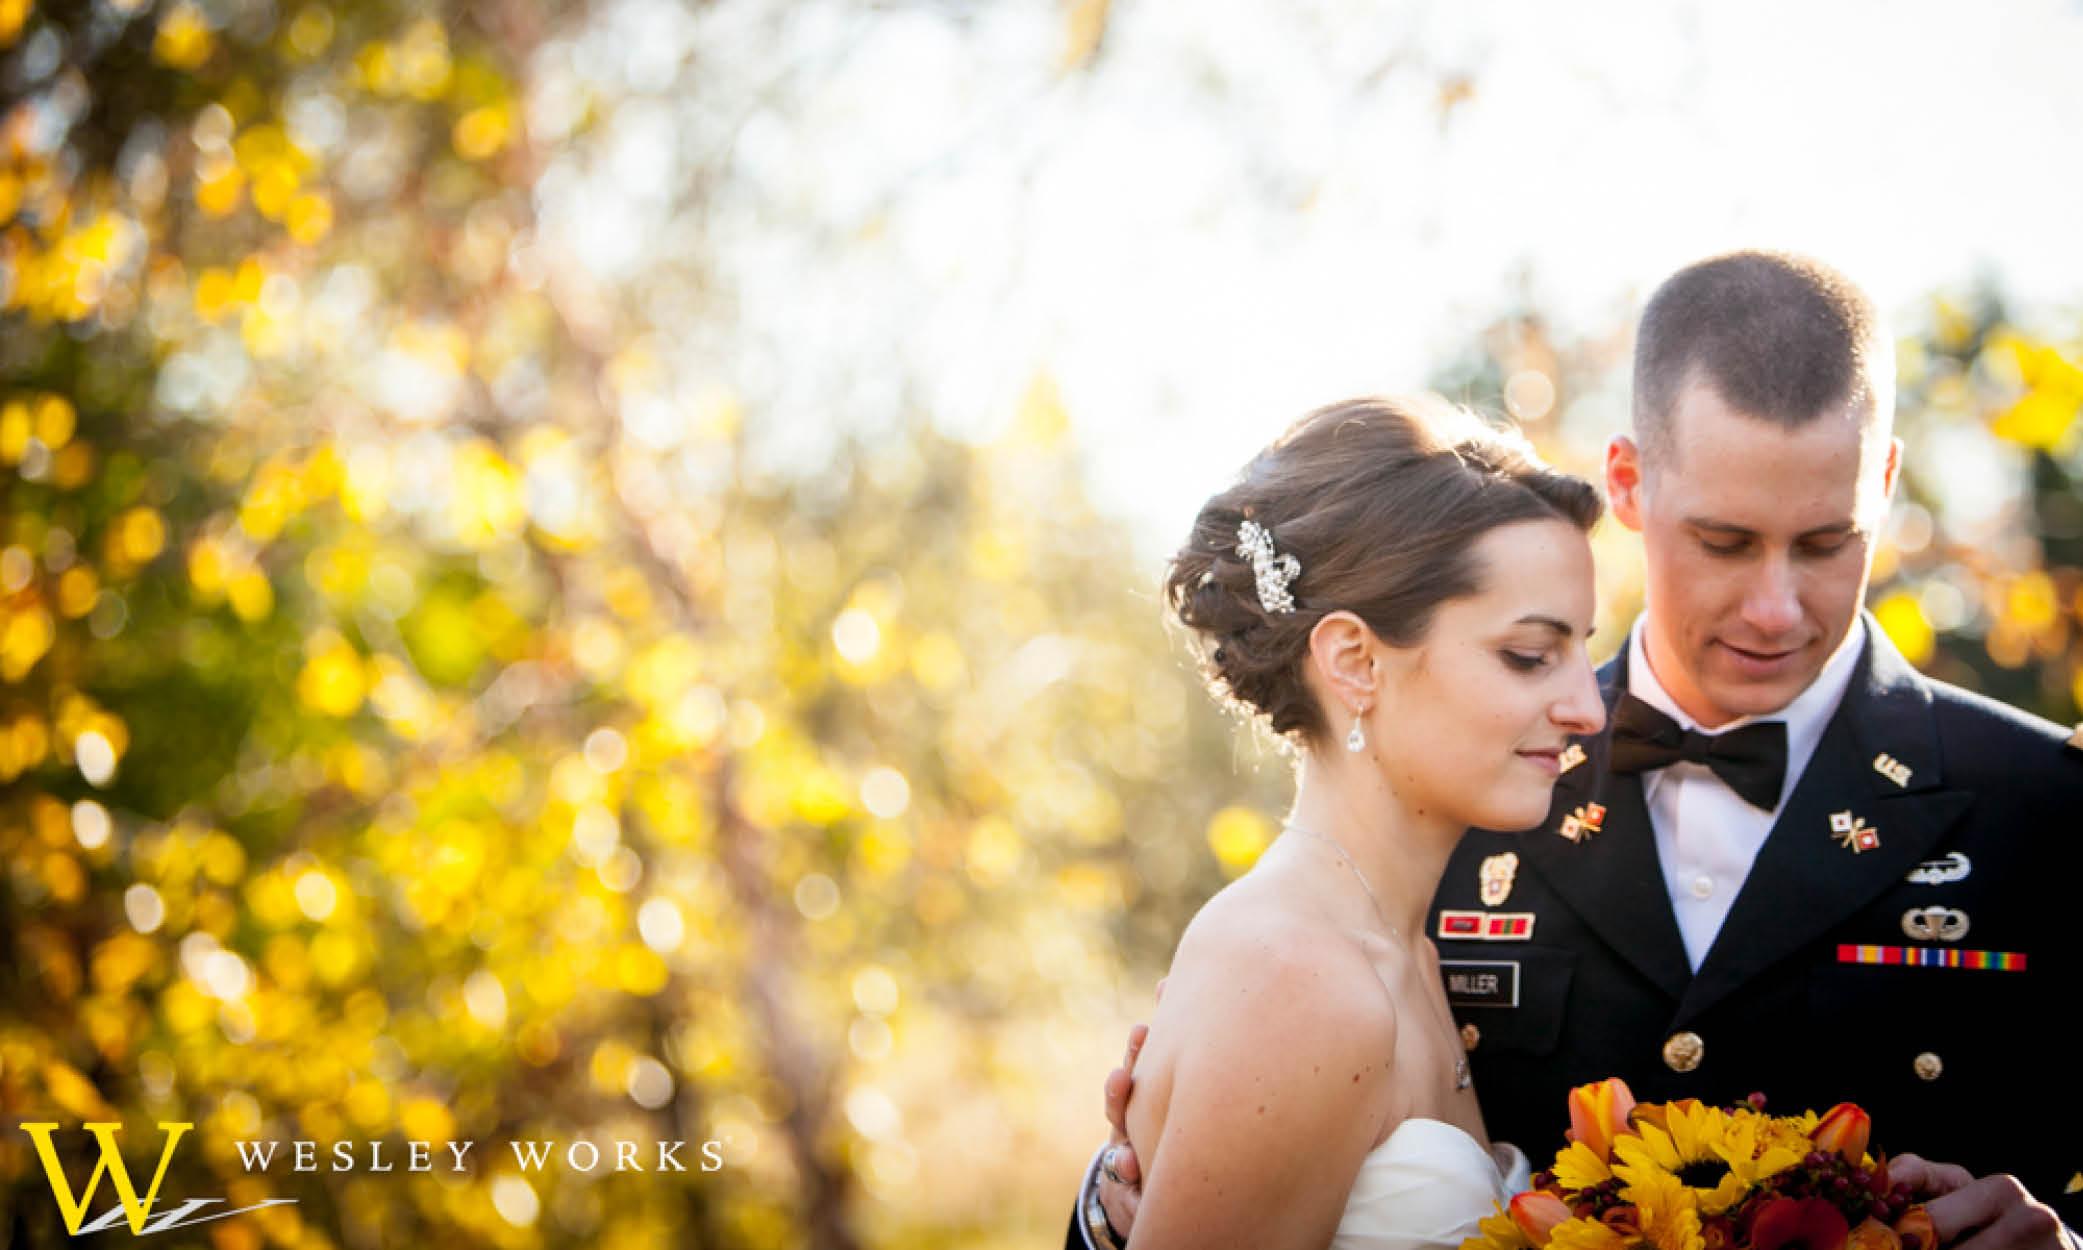 Lehigh Valley Wedding And Reception Sites Wesley Works Dj